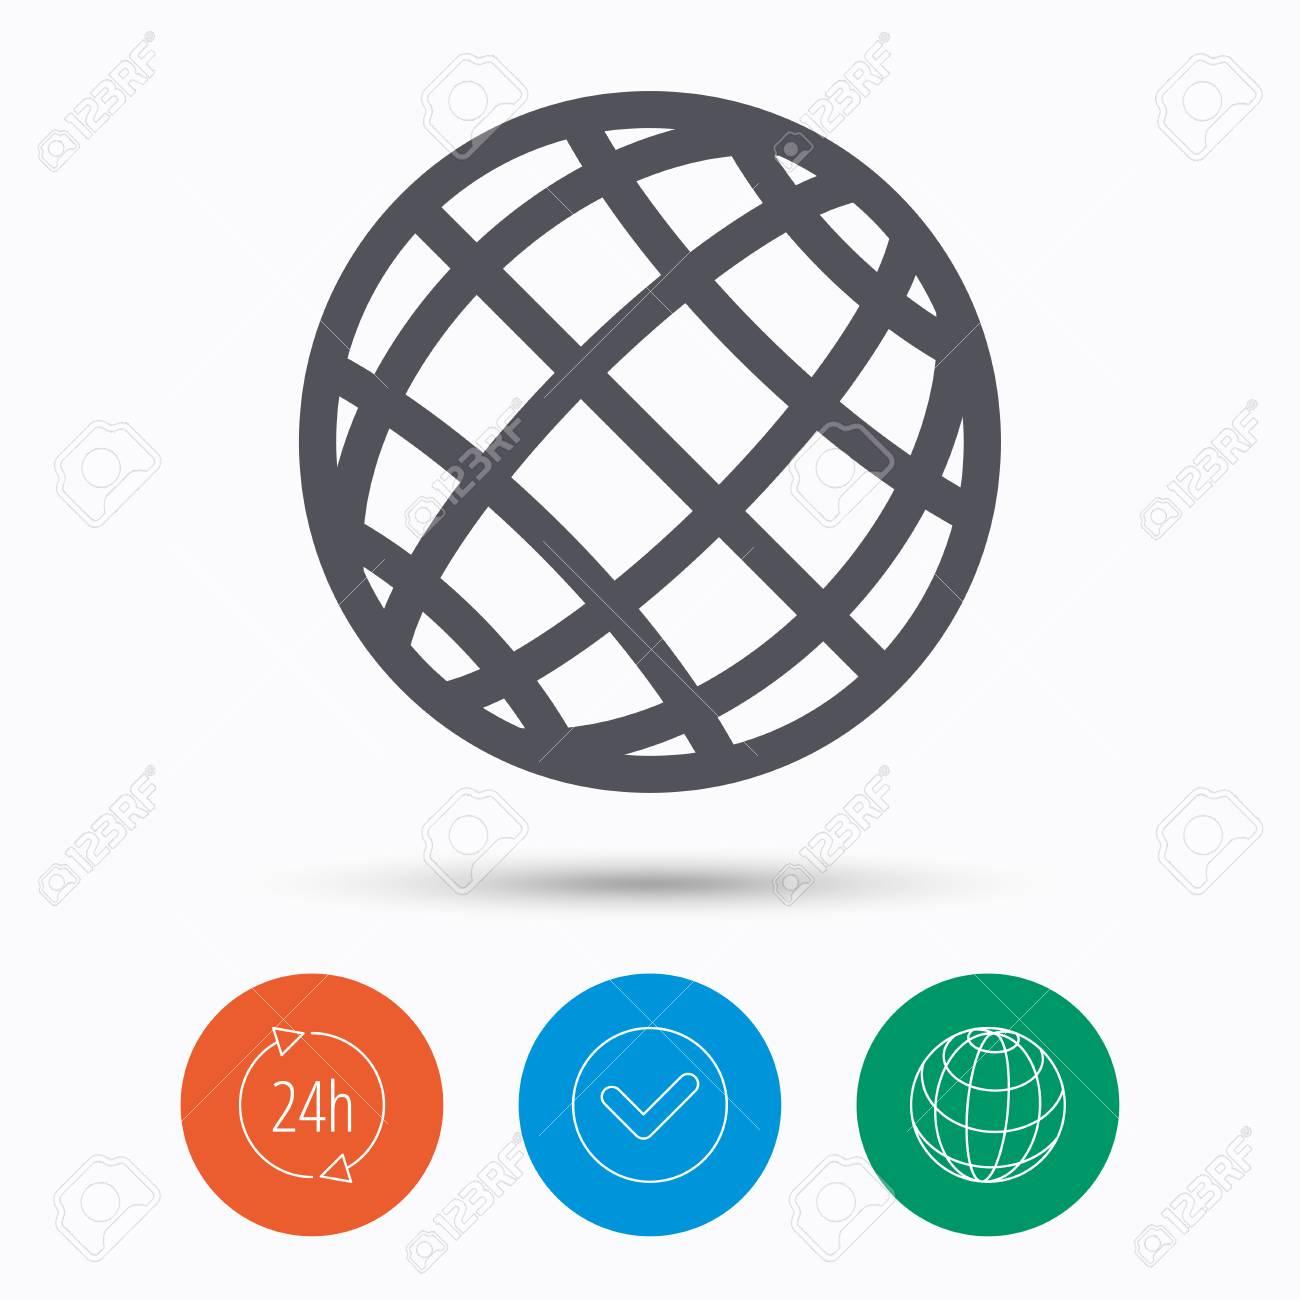 Globe icon world or internet symbol check tick 24 hours service globe icon world or internet symbol check tick 24 hours service and internet biocorpaavc